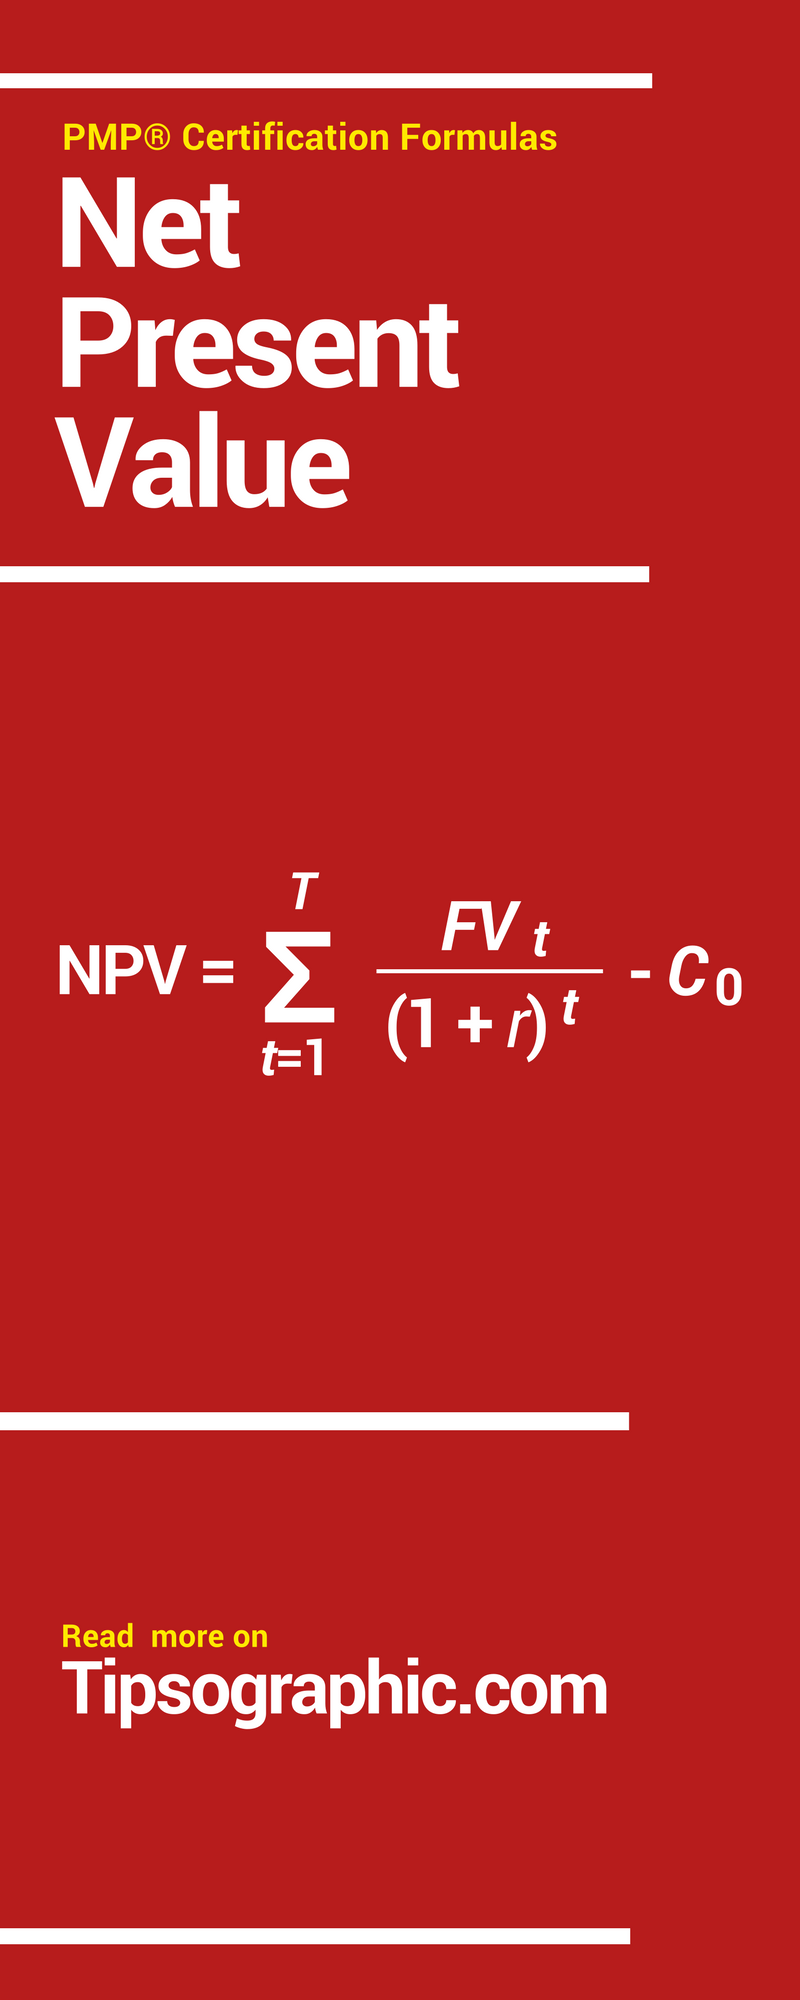 Pmp Certification Formulas Net Present Value Pinterest Pmp Exam